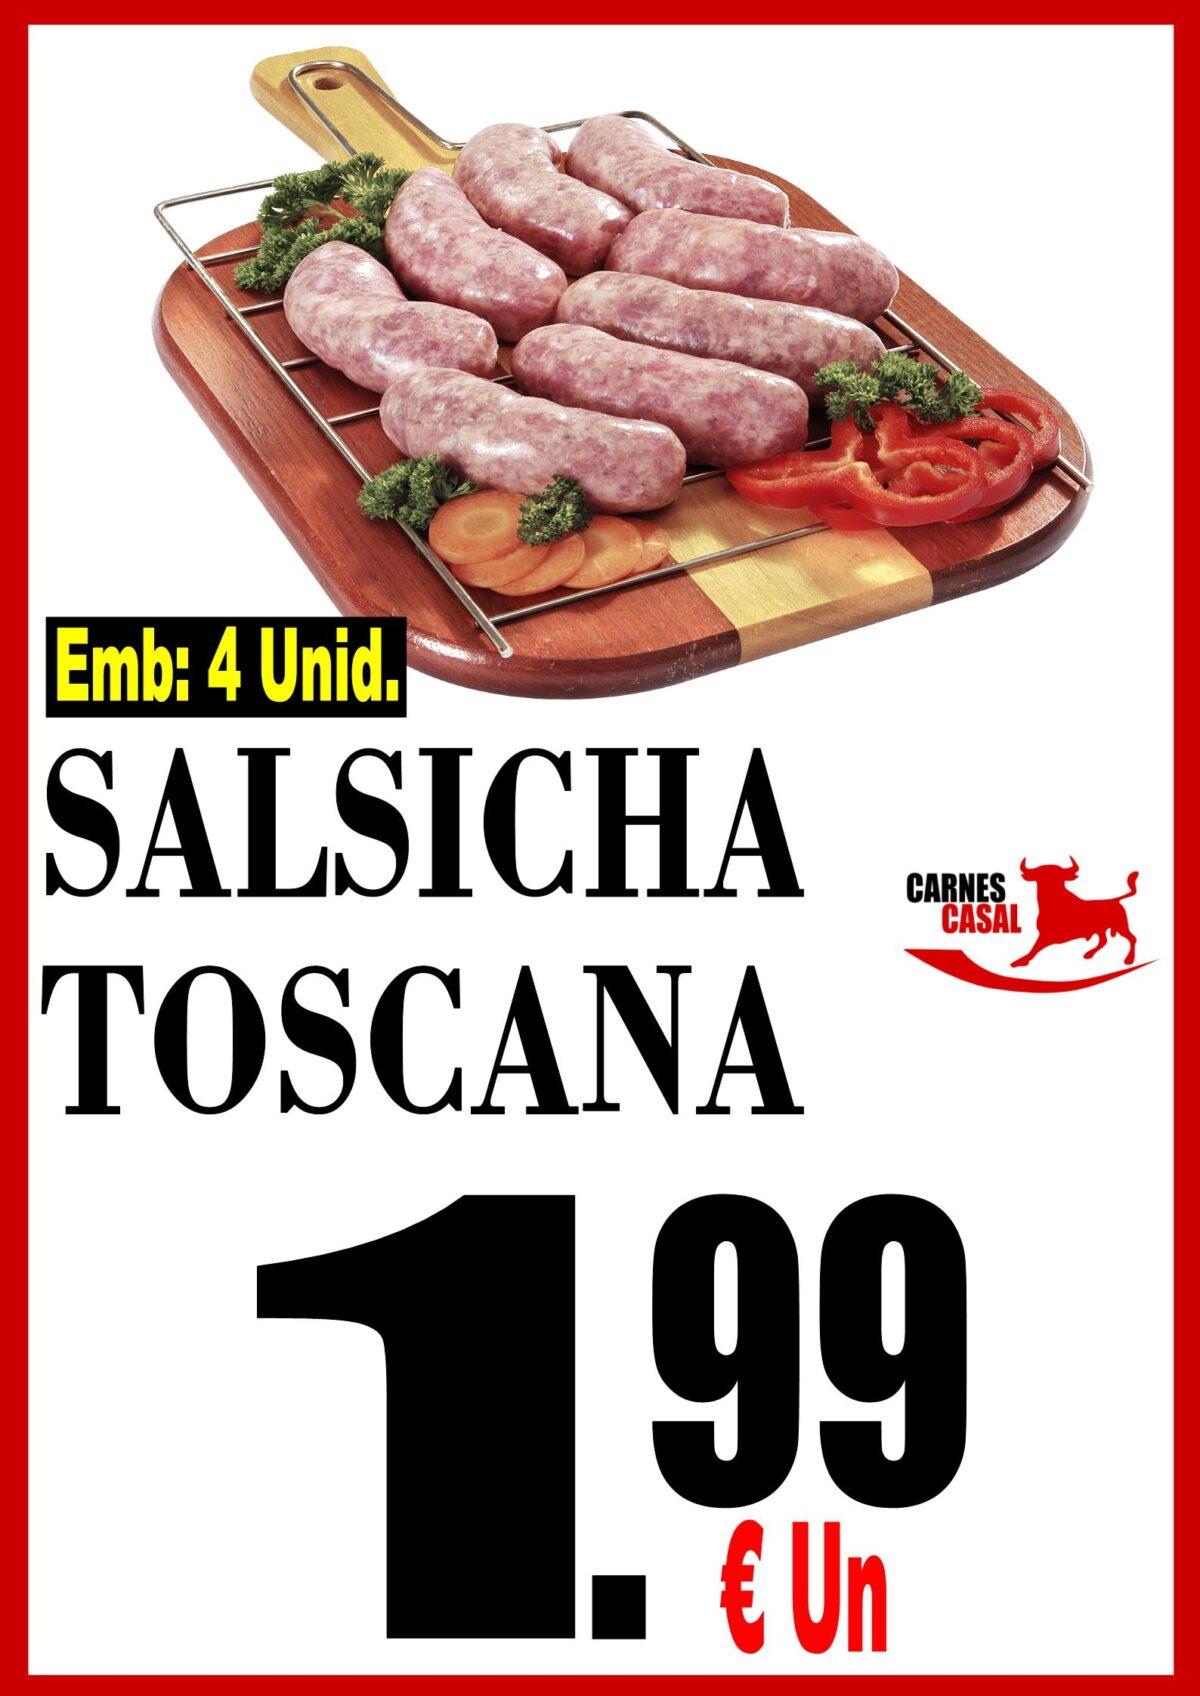 Salsicha Toscana